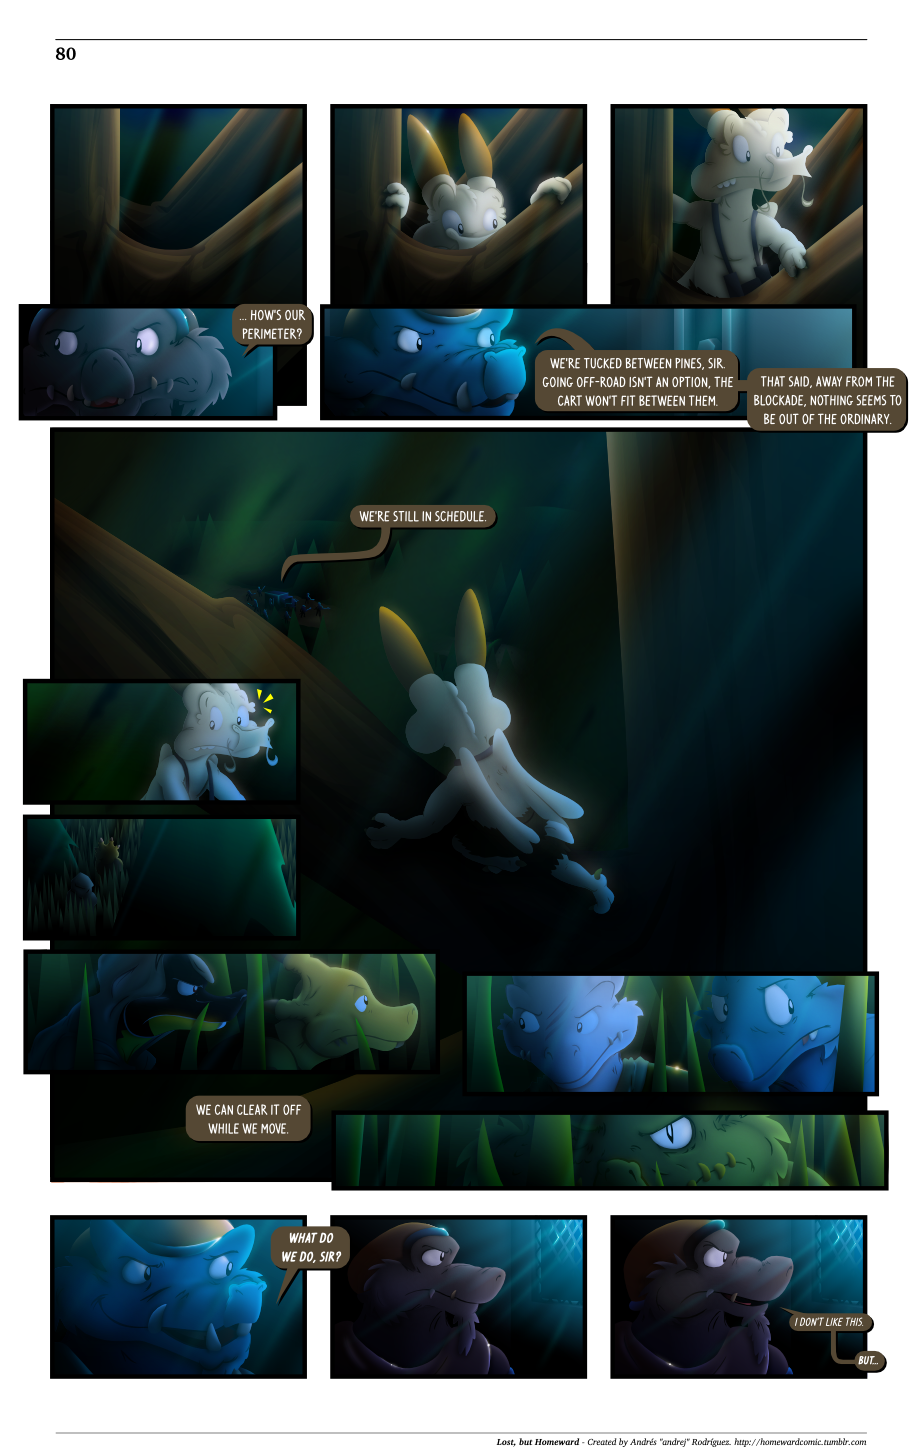 Lost, but Homeward - Page 80 by OhNoAndrej